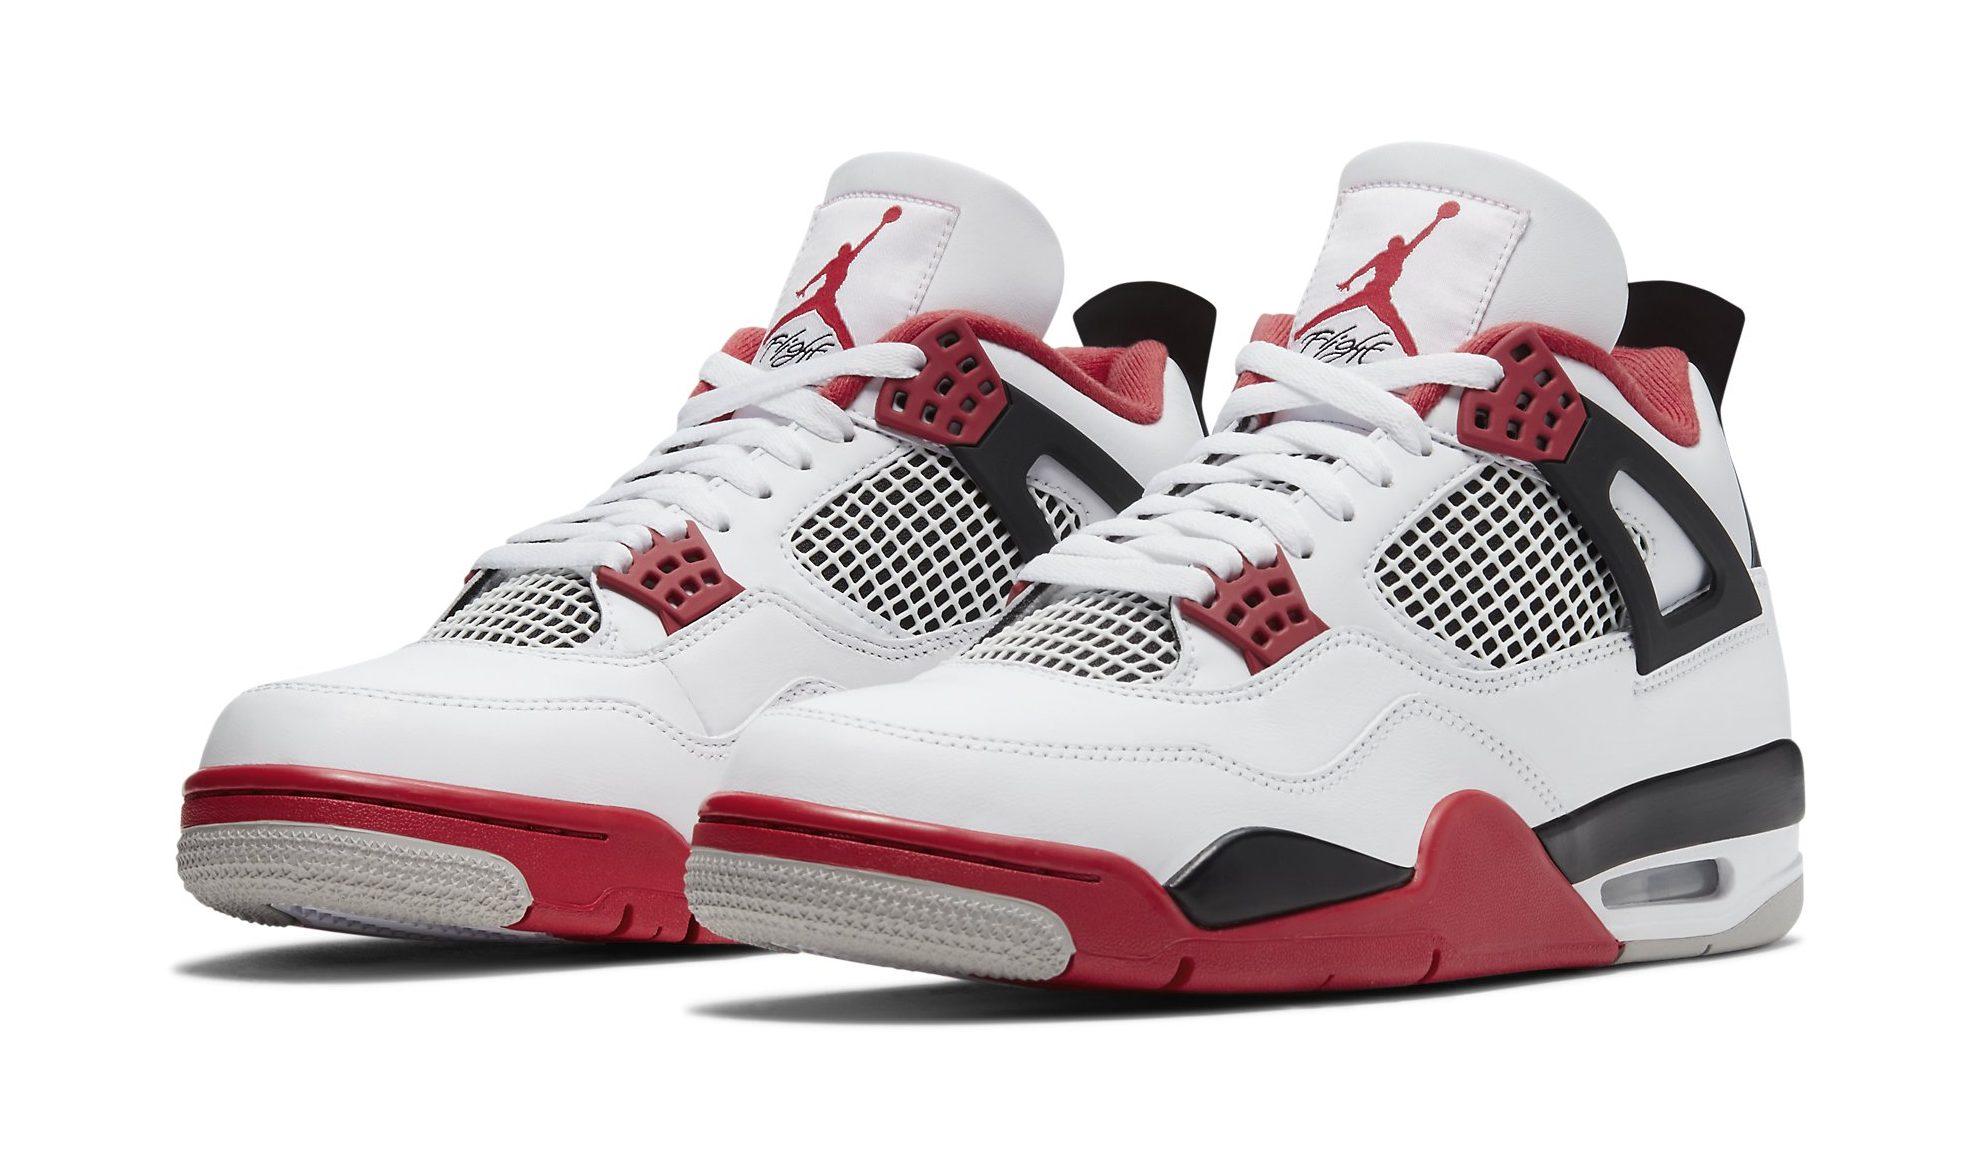 Air Jordan 4 'Fire Red' Shock Drops on